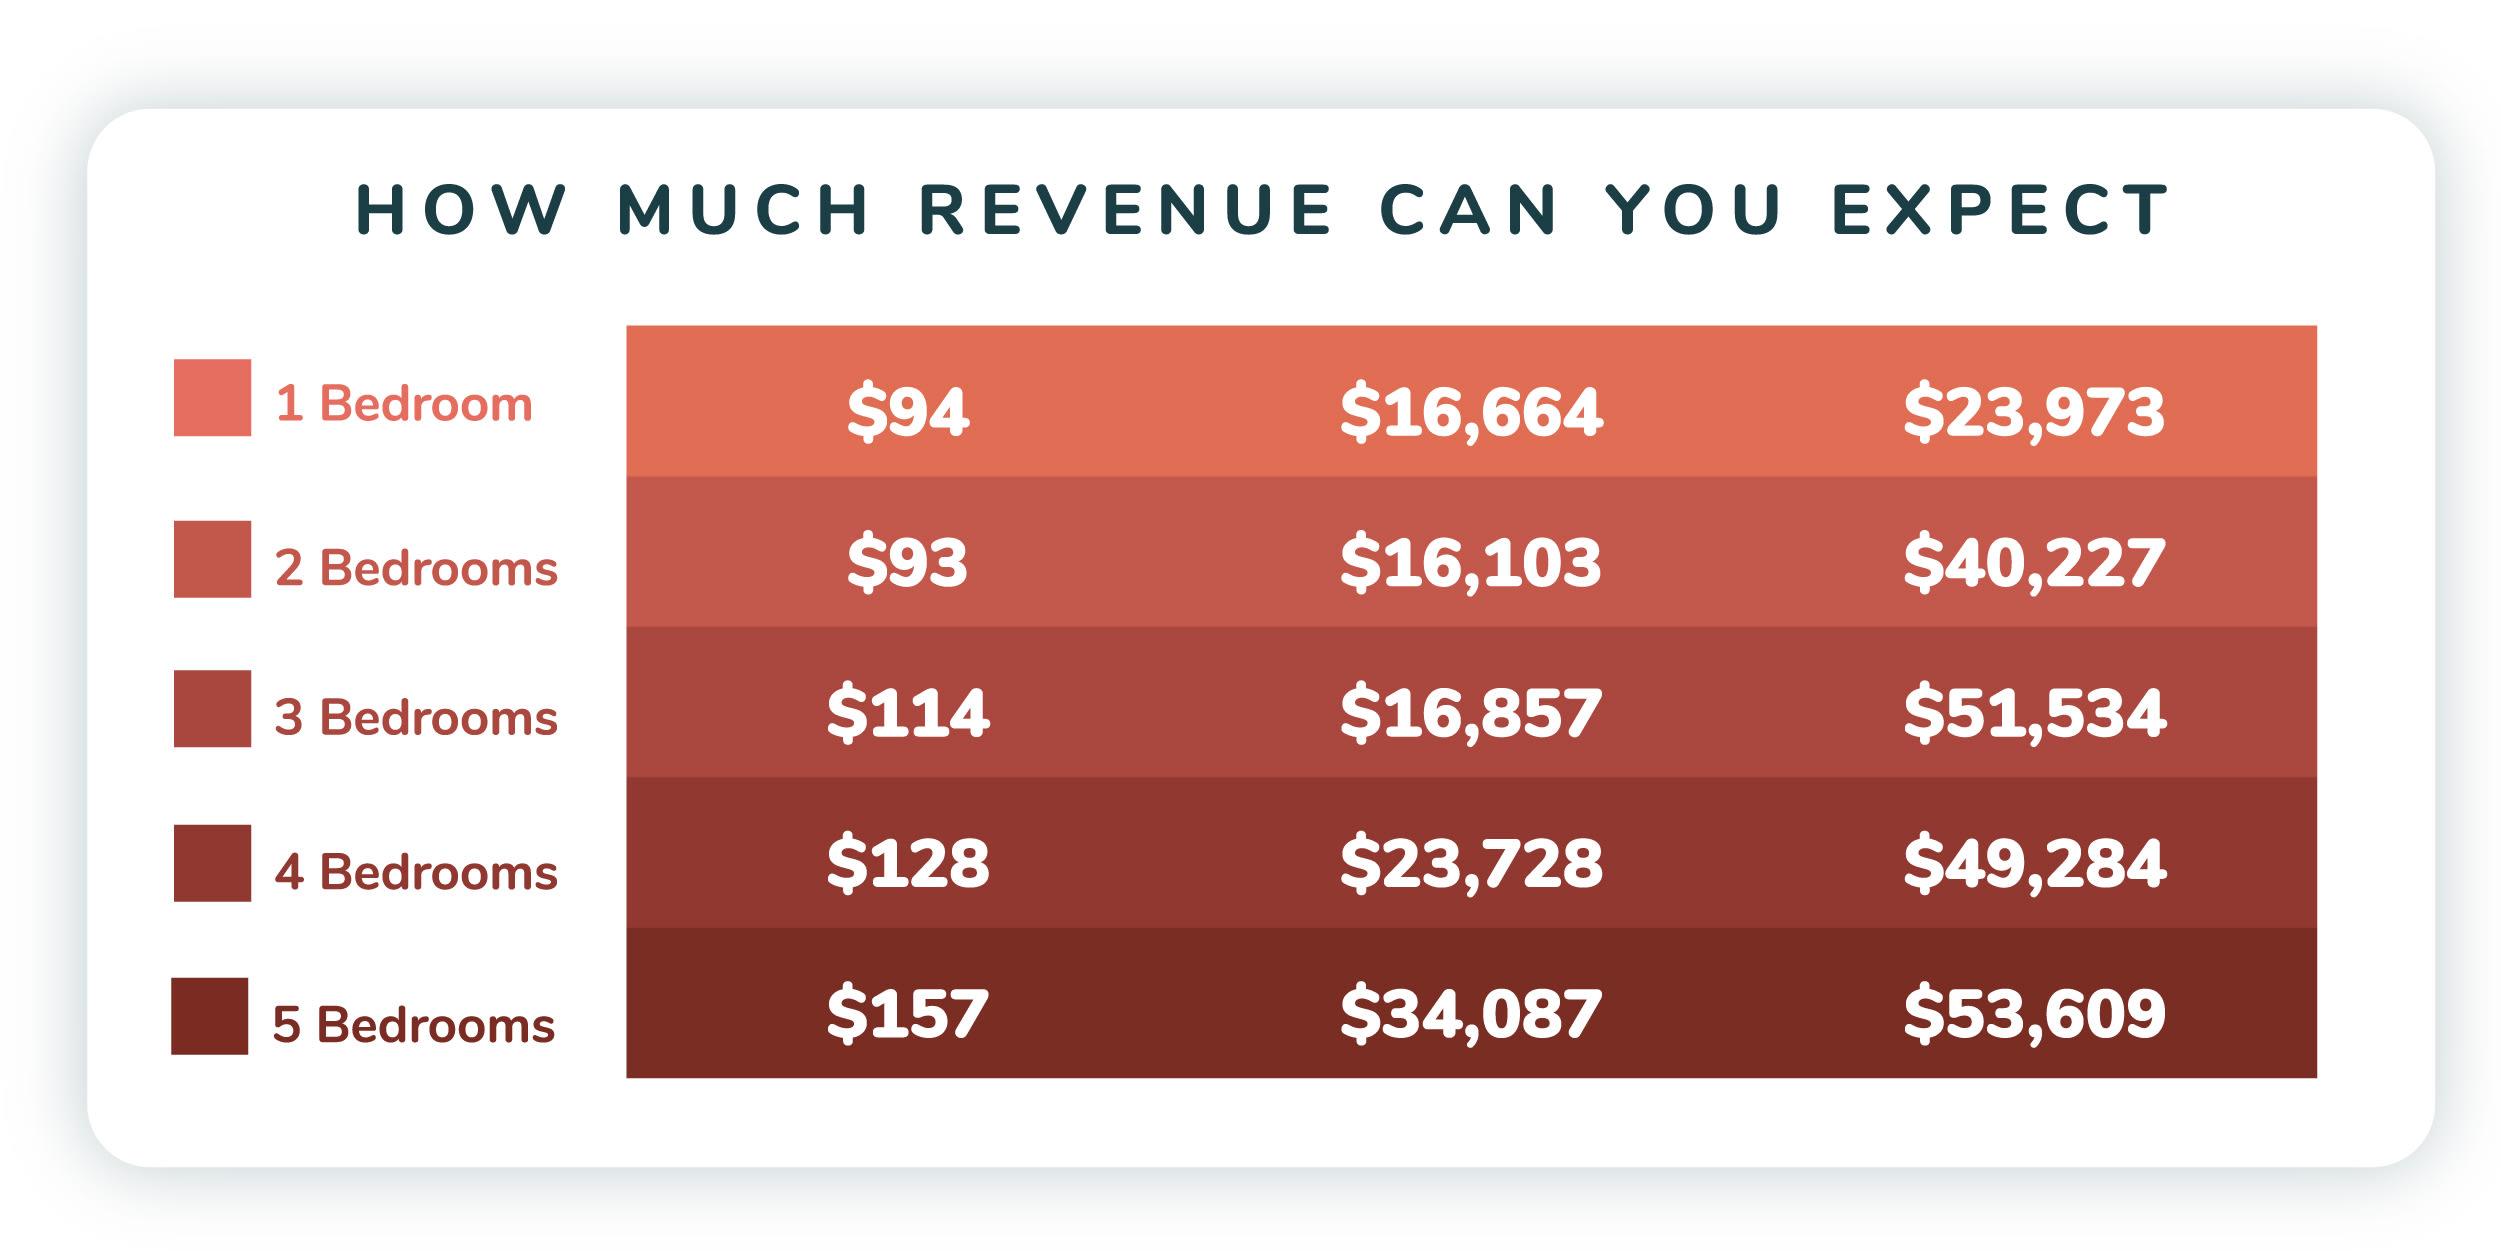 Vacation rental investment revenue estimate graph for the Orlando area